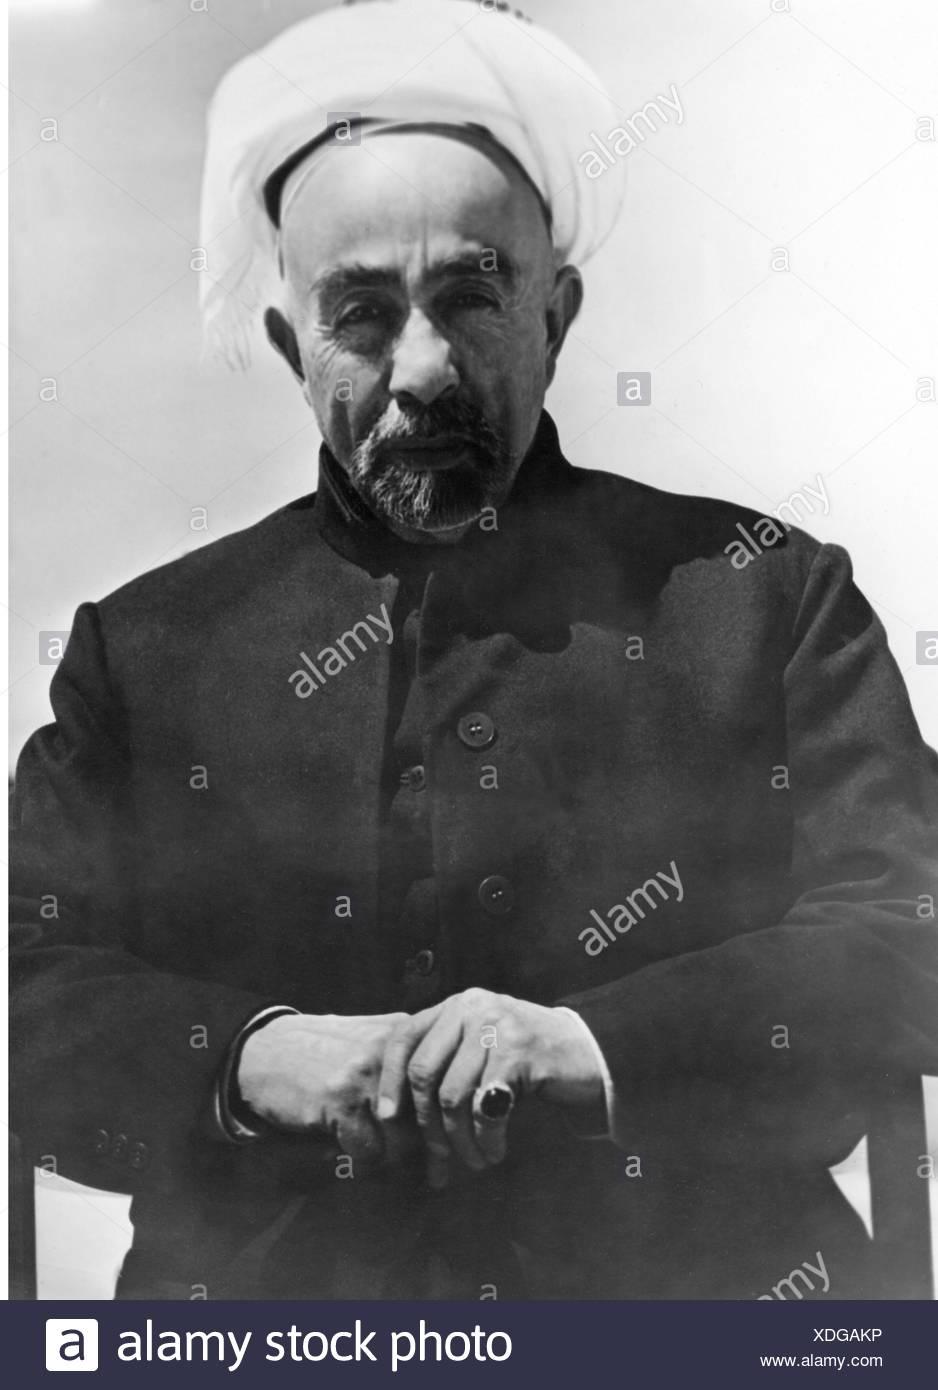 Abdullah I bin al-Hussein, 1880 - 20.7.1951, Emir of Transjordan 1.4.1921 - 25.5.1946, King of Jordan 25.5.1946 - 20.7.1951, half length, 1940s, Additional-Rights-Clearances-NA - Stock Image